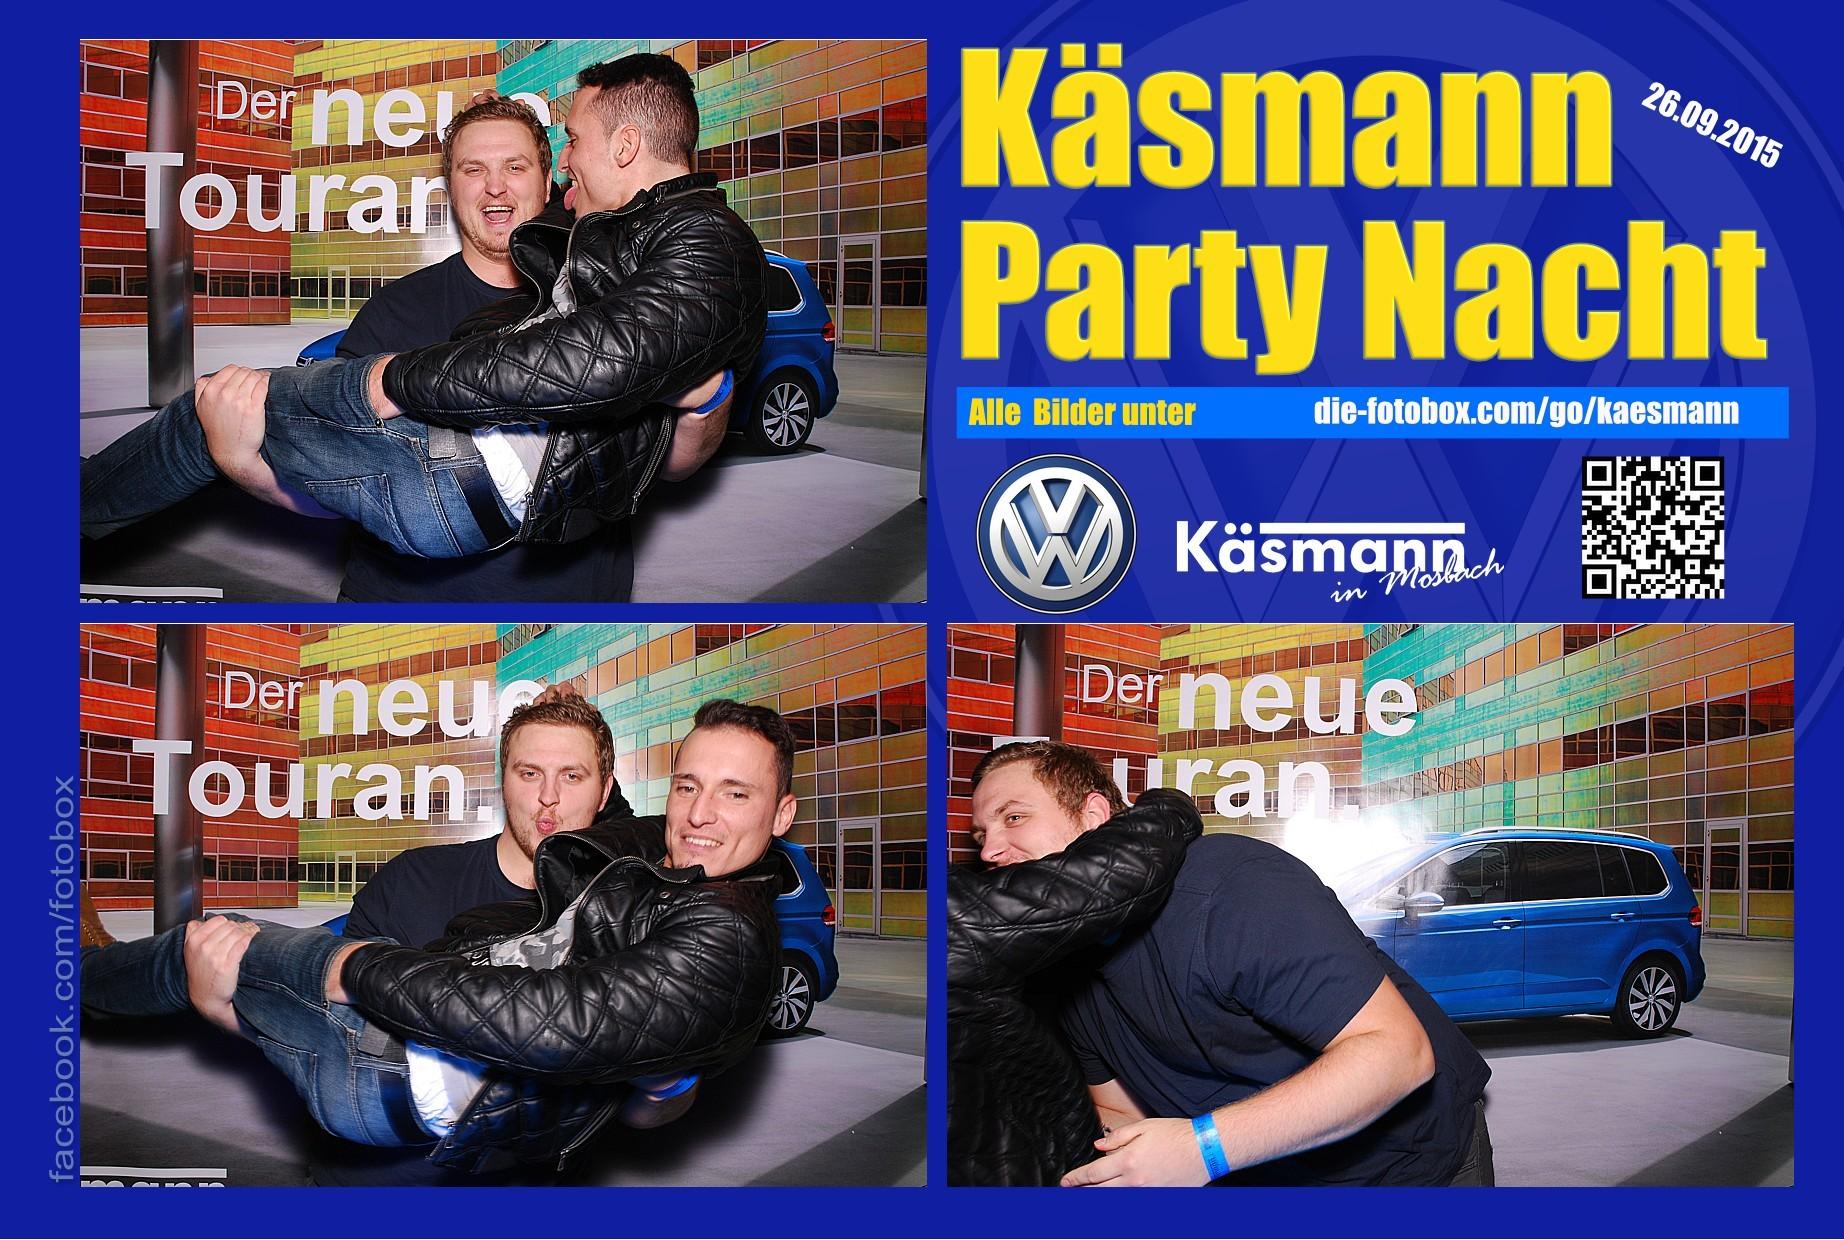 Käsmannparty 2015 - www.die-fotobox.com 01060